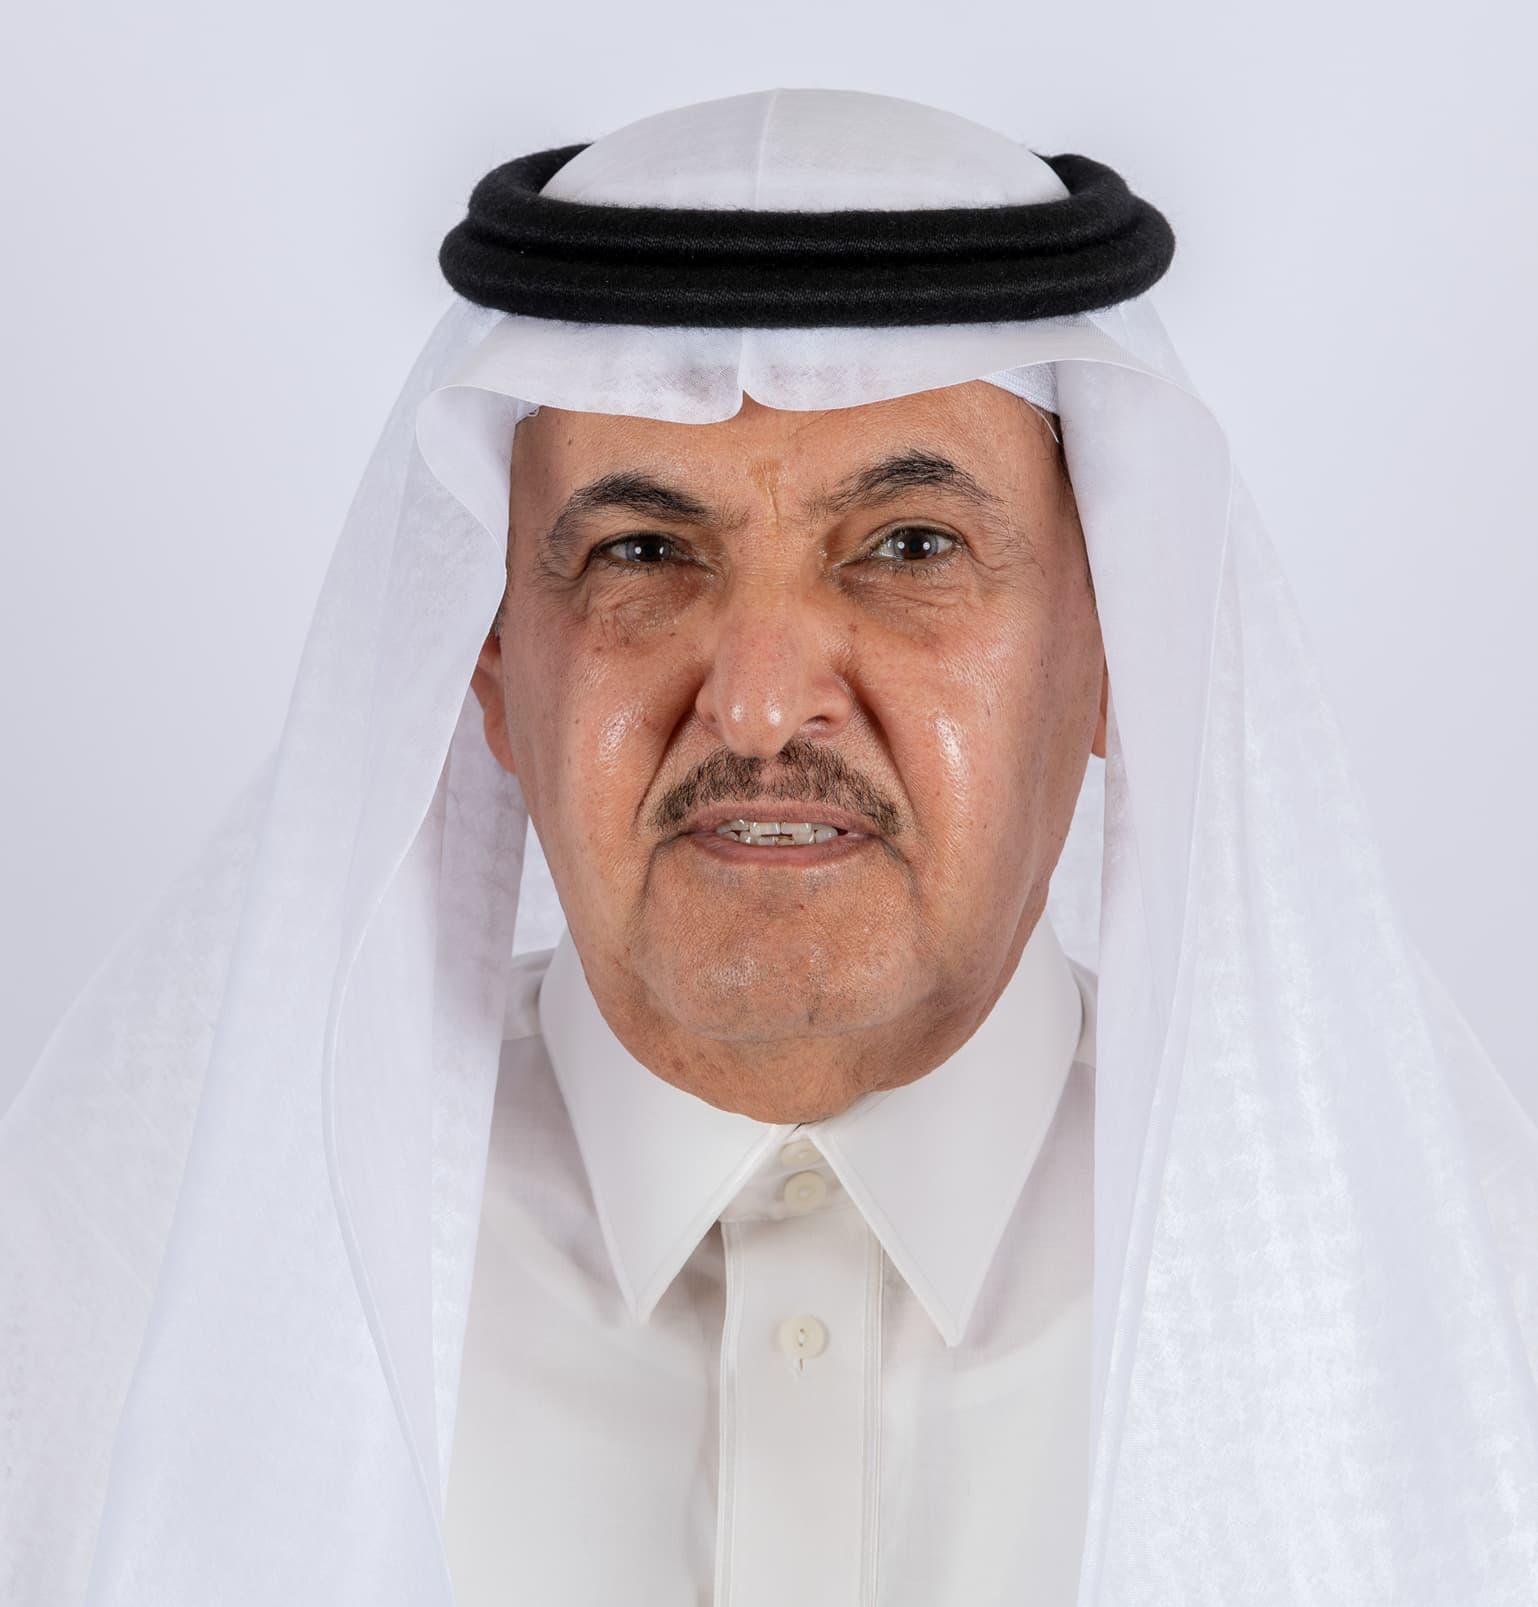 المهندس عبدالله سليمان الربيعان